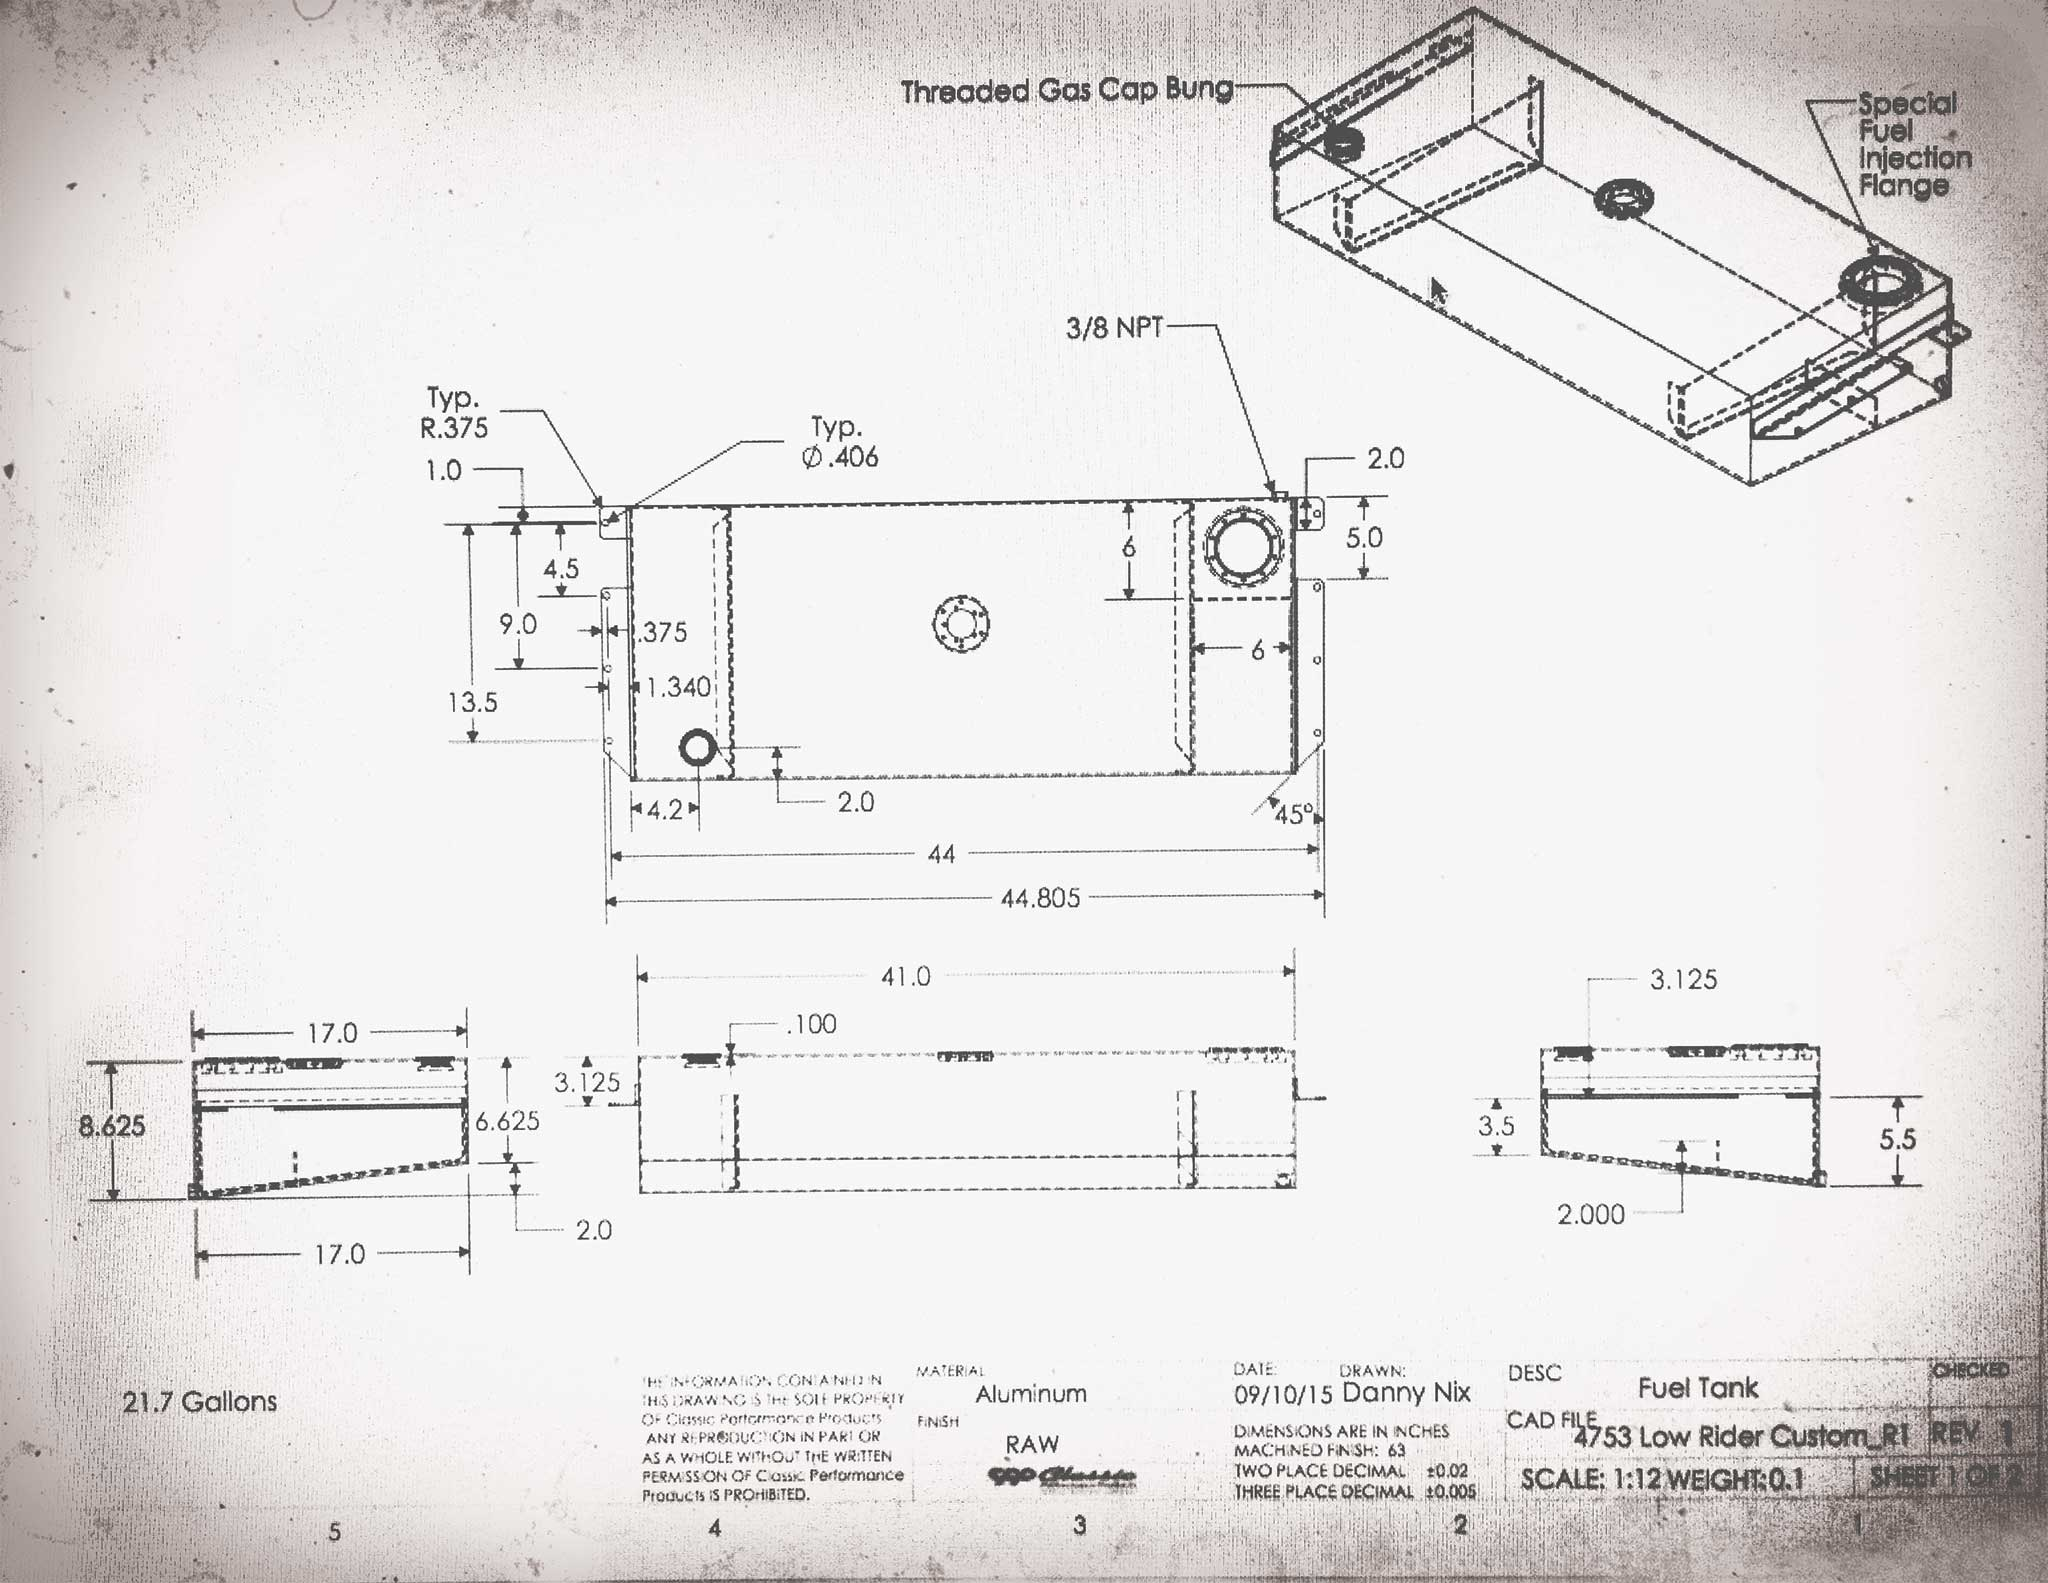 hight resolution of fuel tank schematic diagram